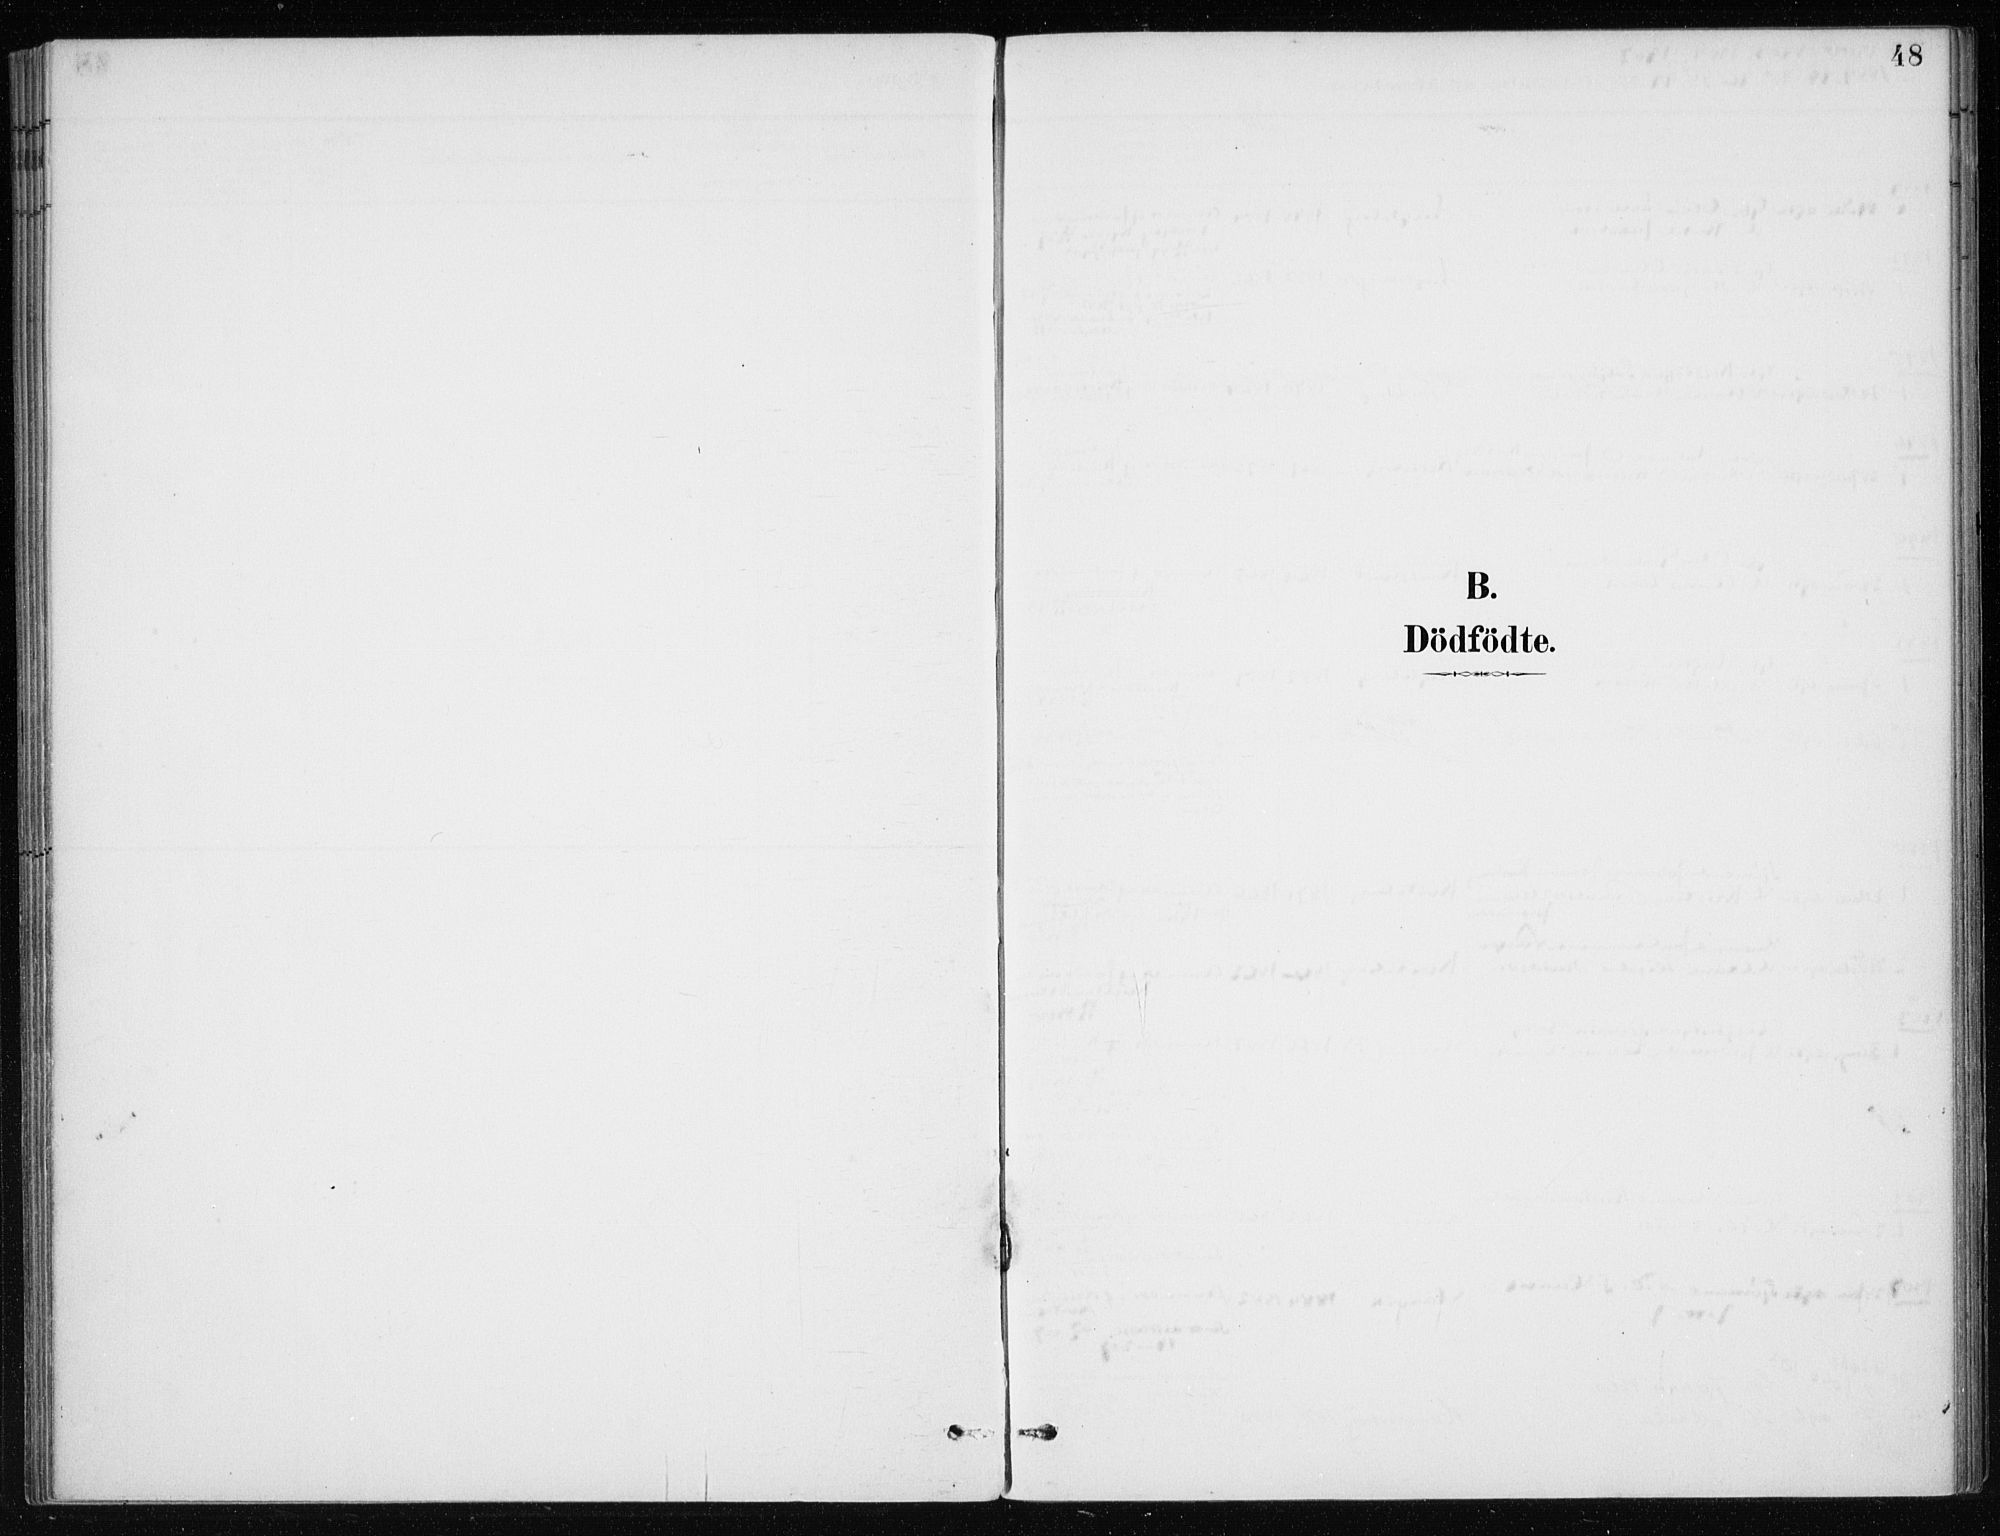 SAB, Kvinnherad Sokneprestembete, H/Haa: Ministerialbok nr. E 1, 1887-1912, s. 48